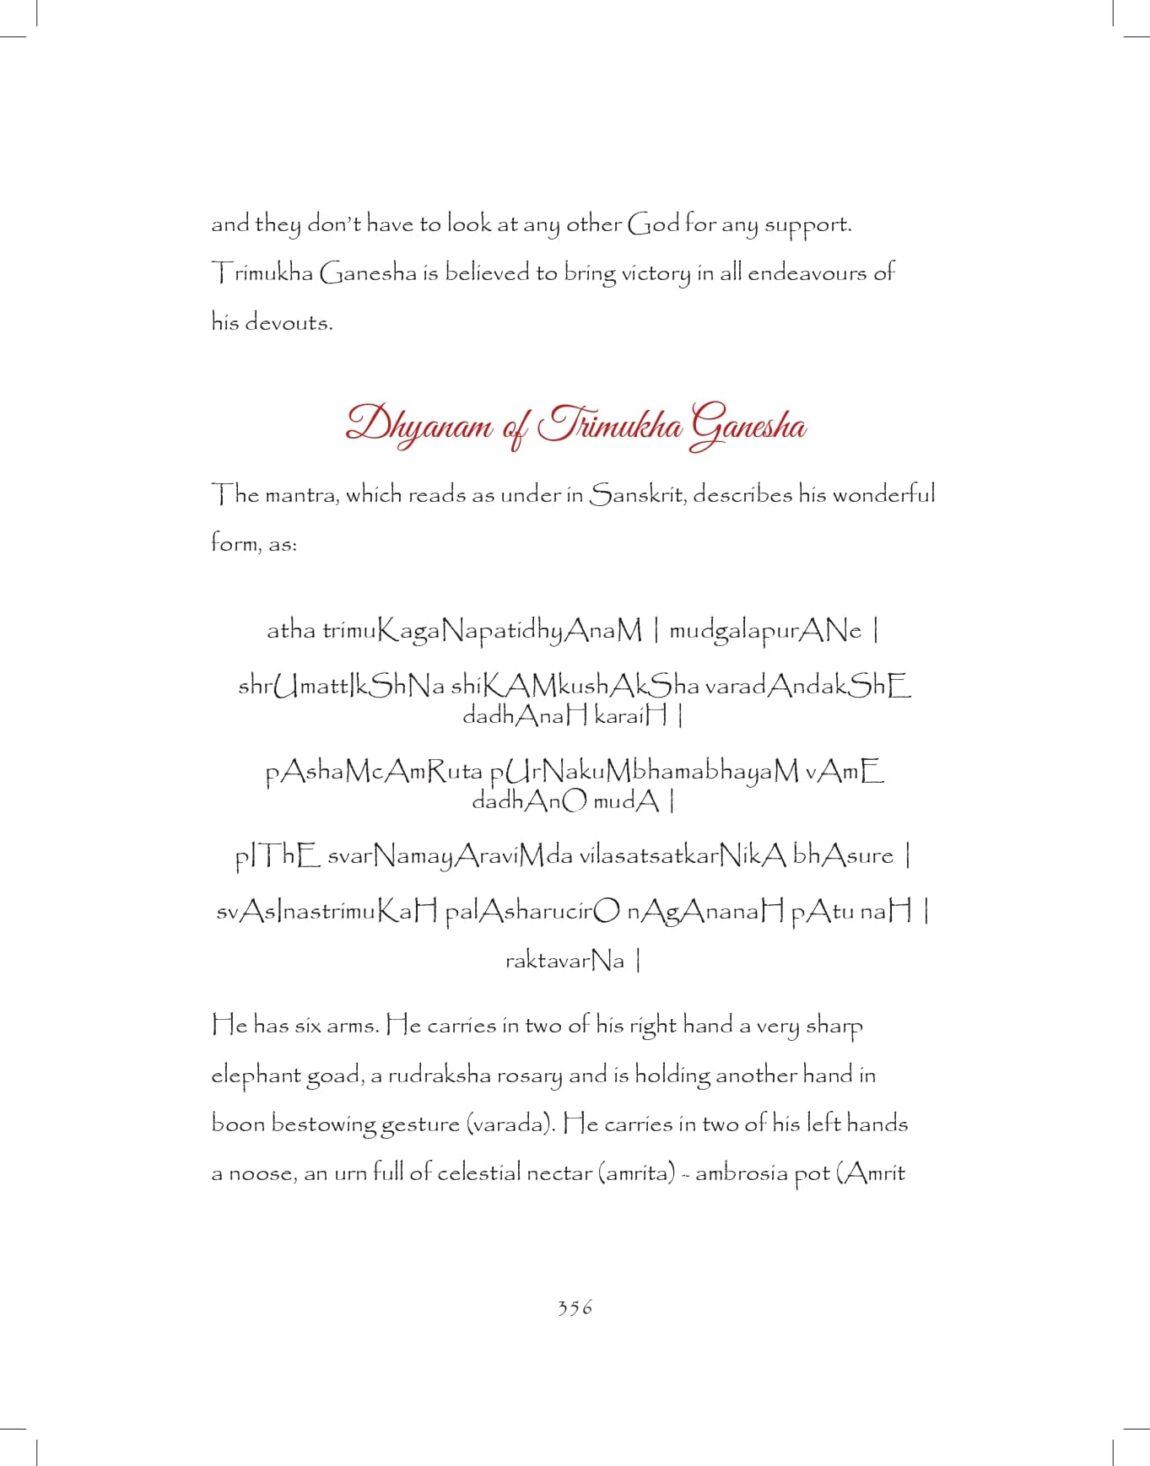 Ganesh-print_pages-to-jpg-0356.jpg